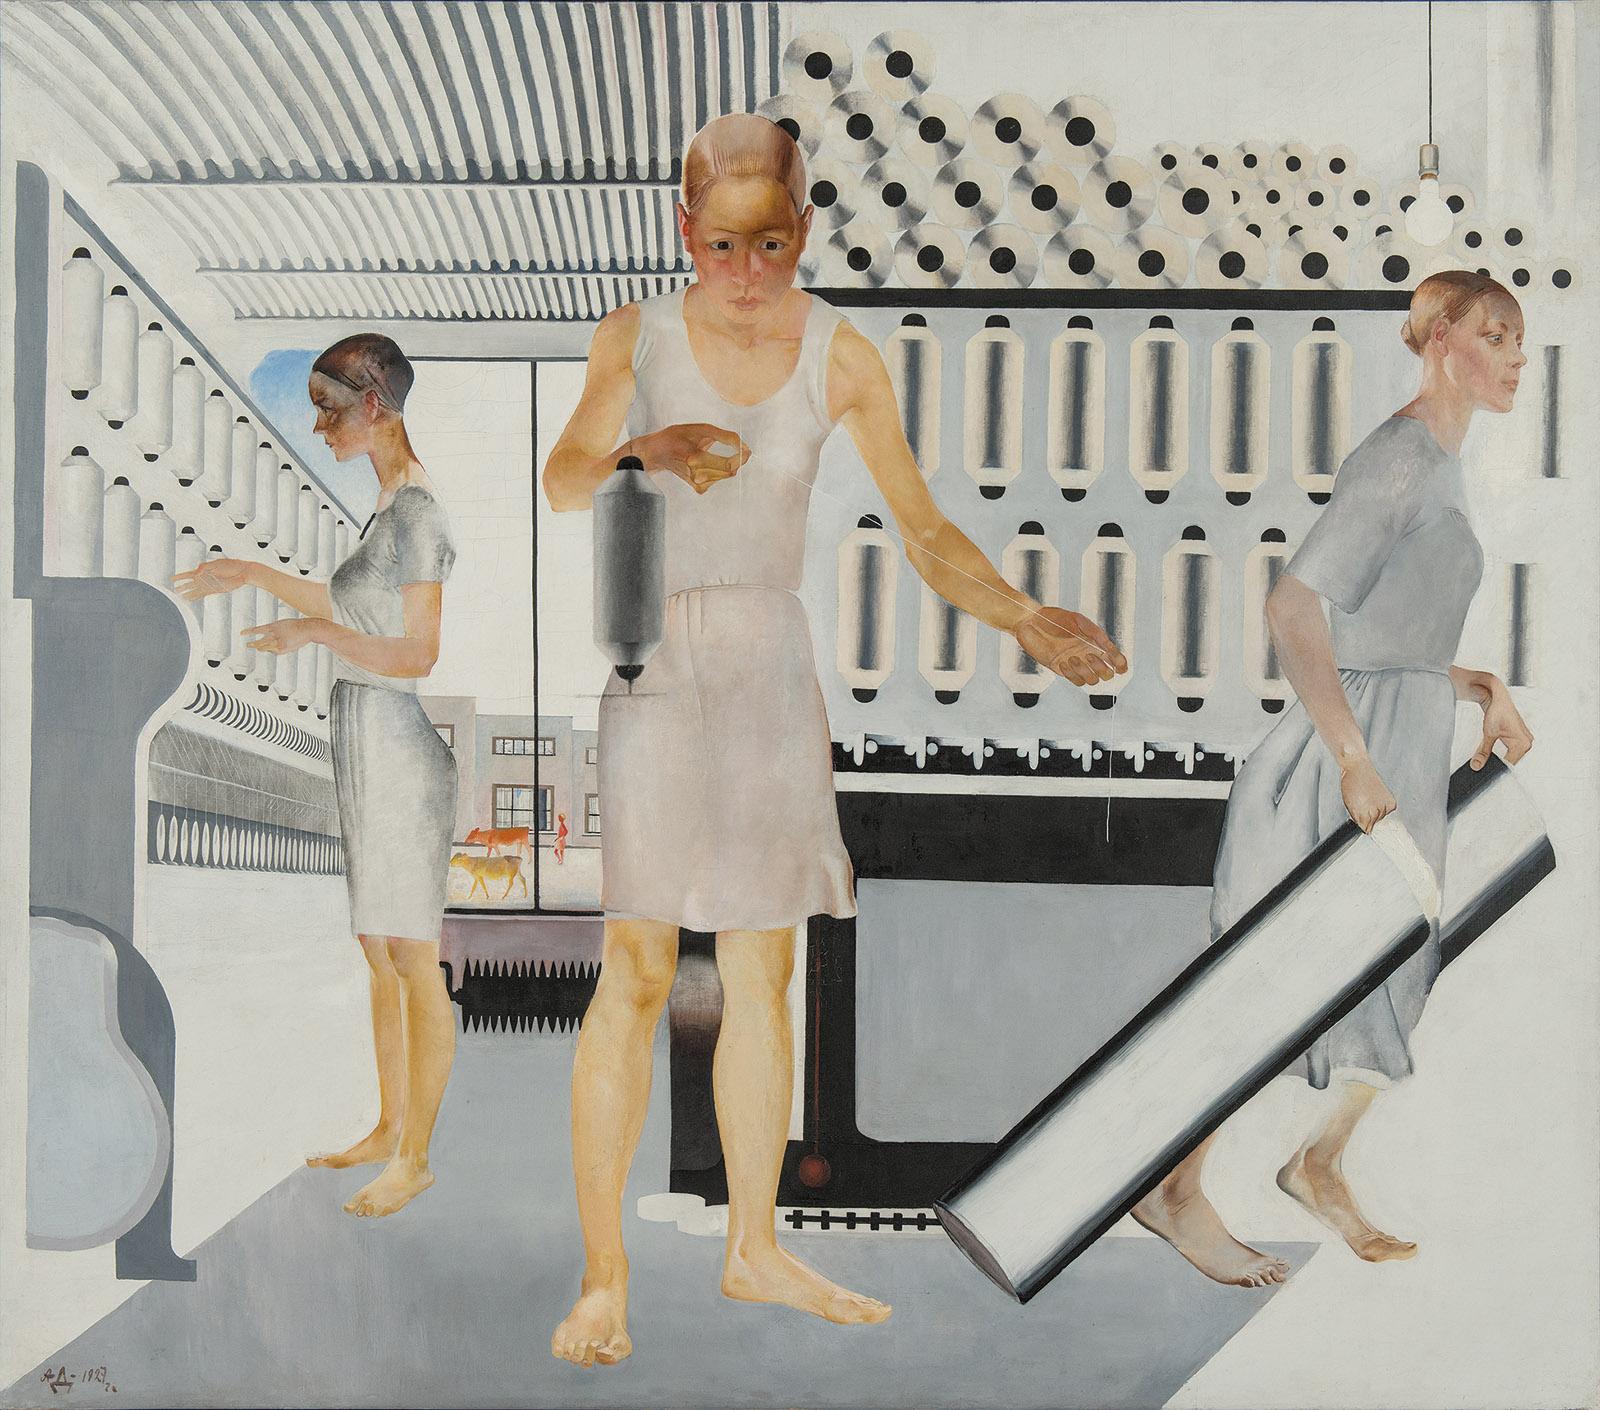 Textile Workers; painting by Aleksandr Deineka